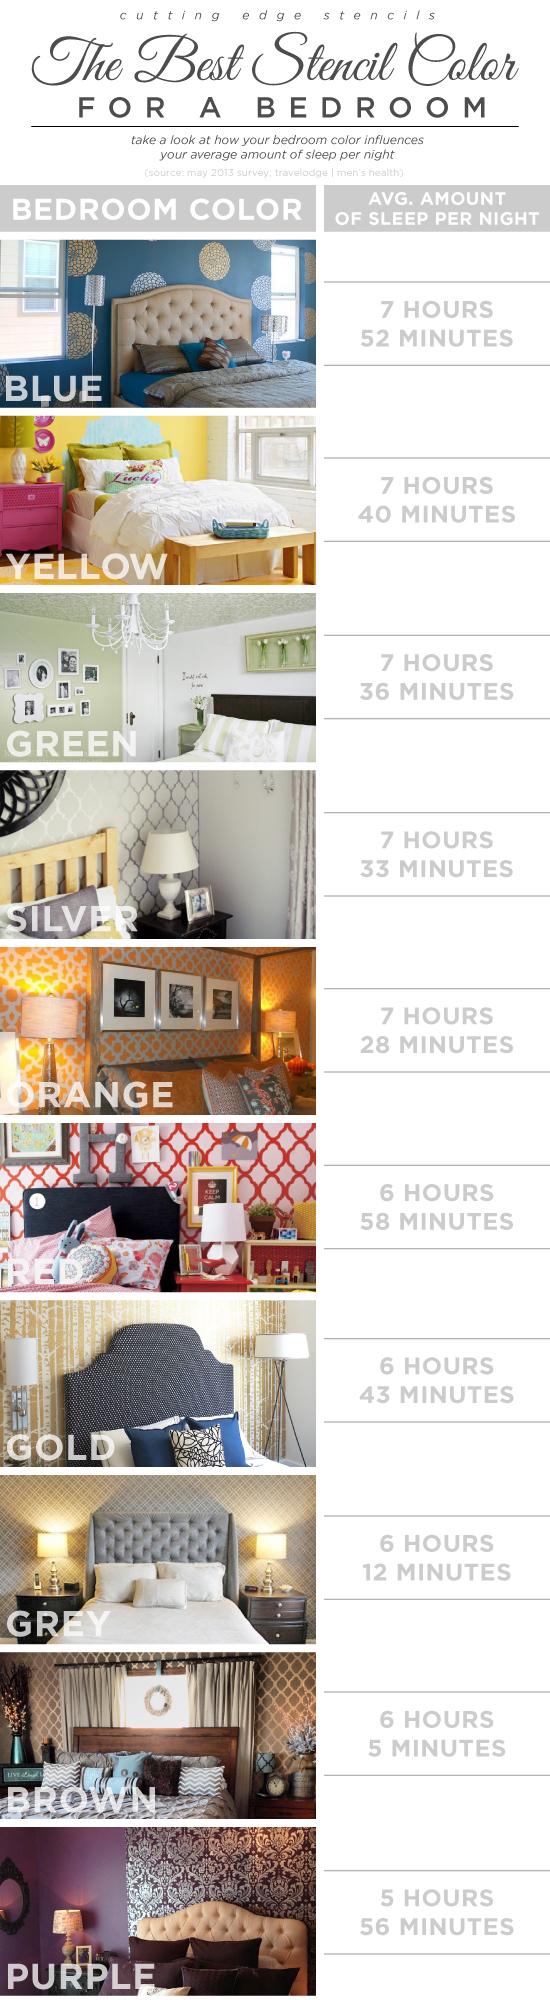 Cutting Edge Stencils shares the best stencil colors for a bedroom! http://www.cuttingedgestencils.com/wall-stencils-stencil-designs.html